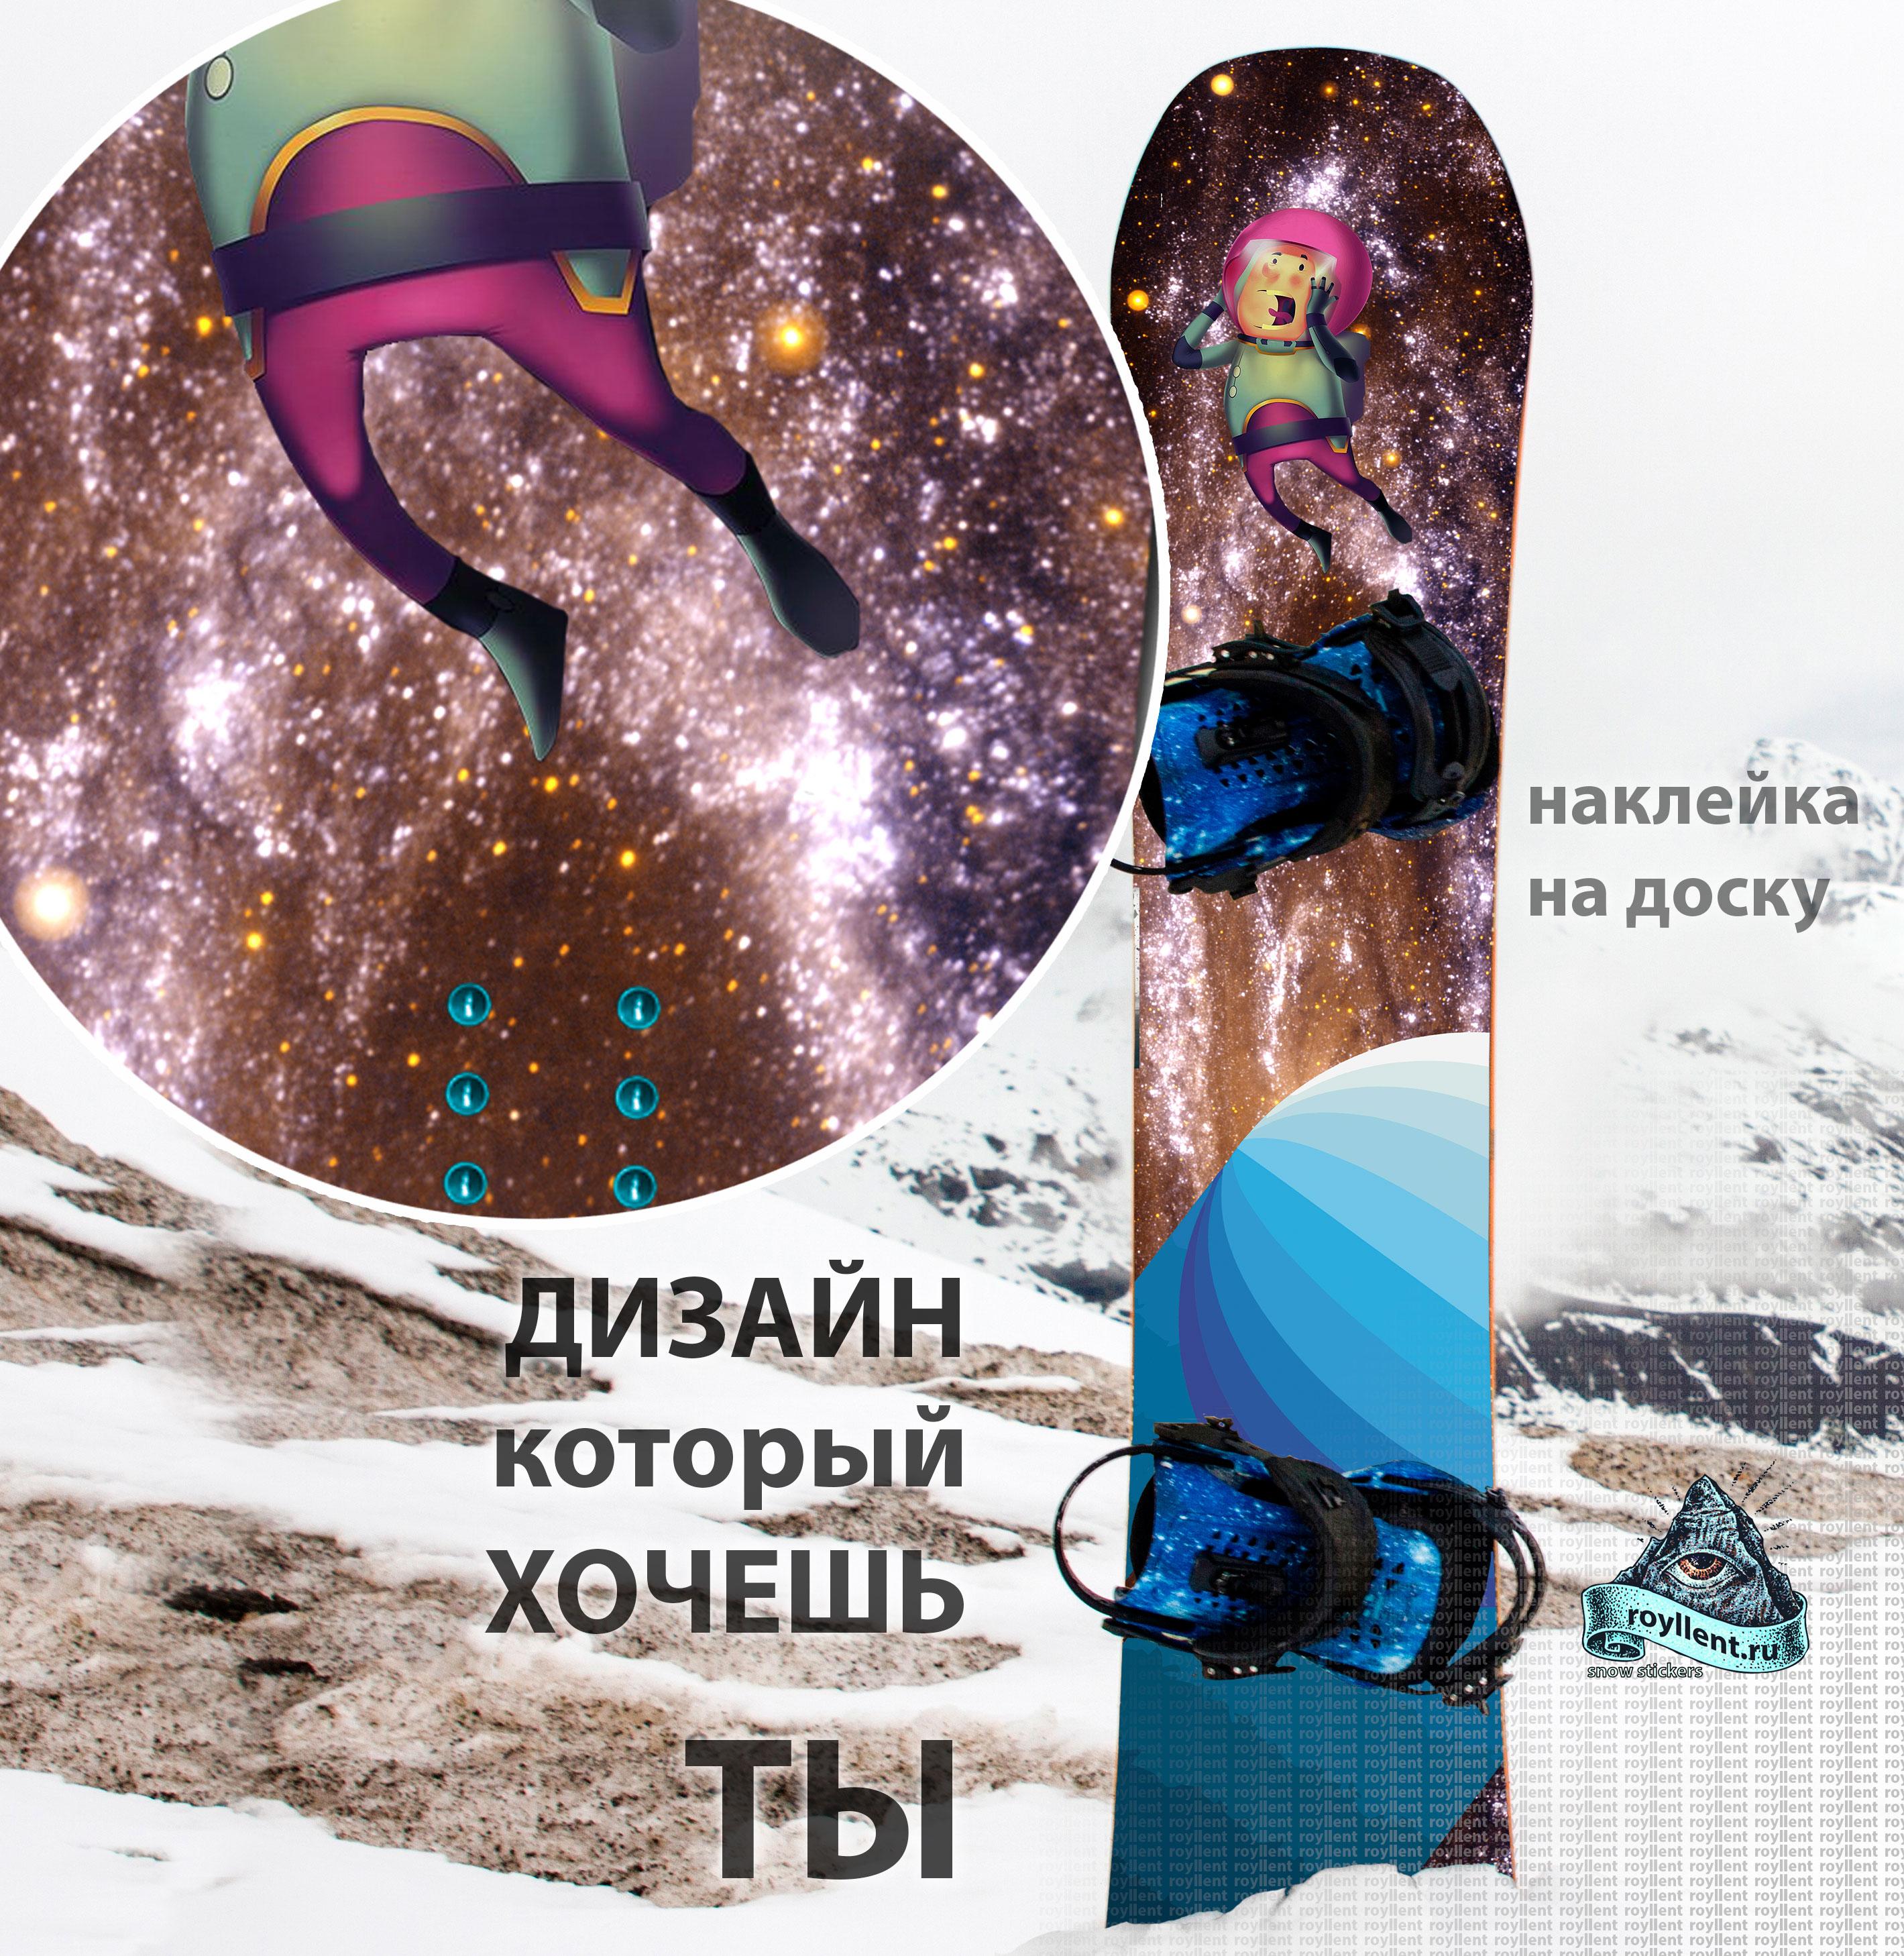 сноуборд наклейка космос